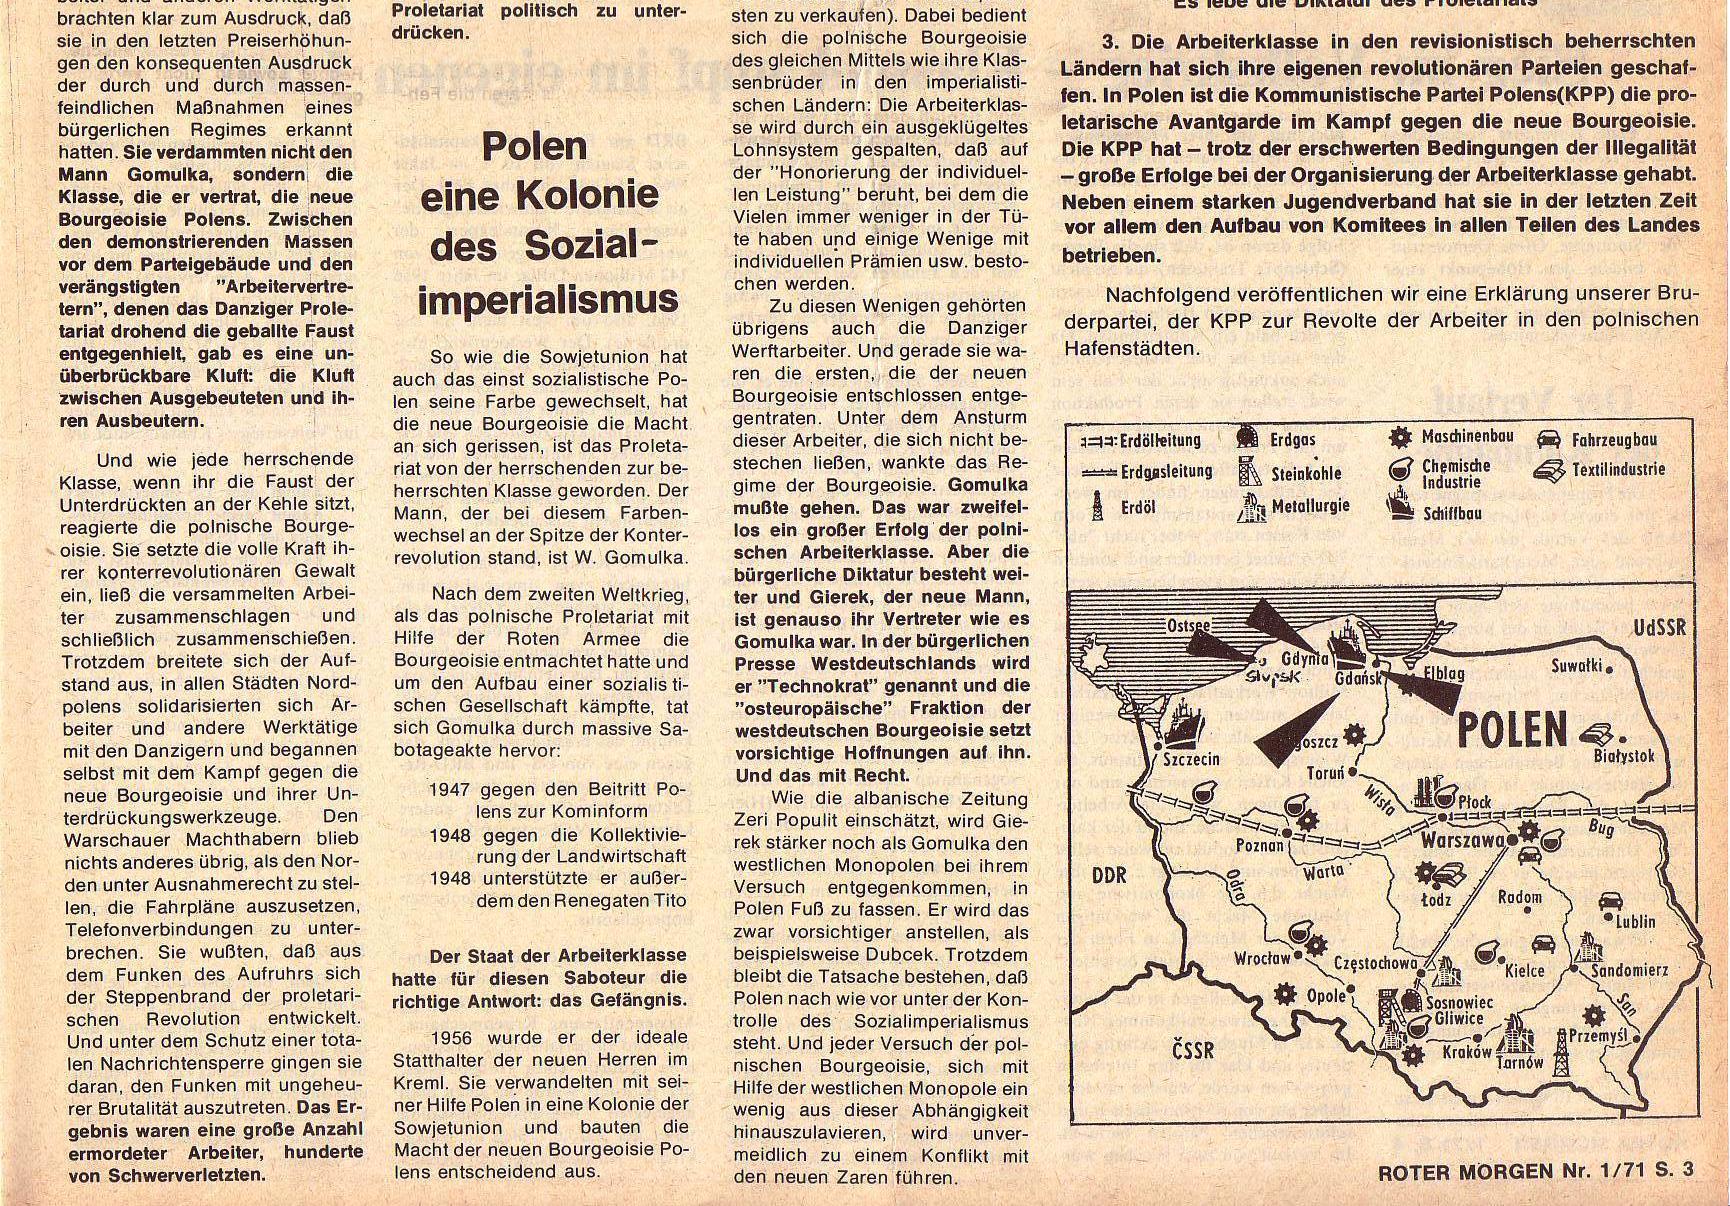 Roter Morgen, 5. Jg., Januar 1971, Nr. 1, Seite 3b